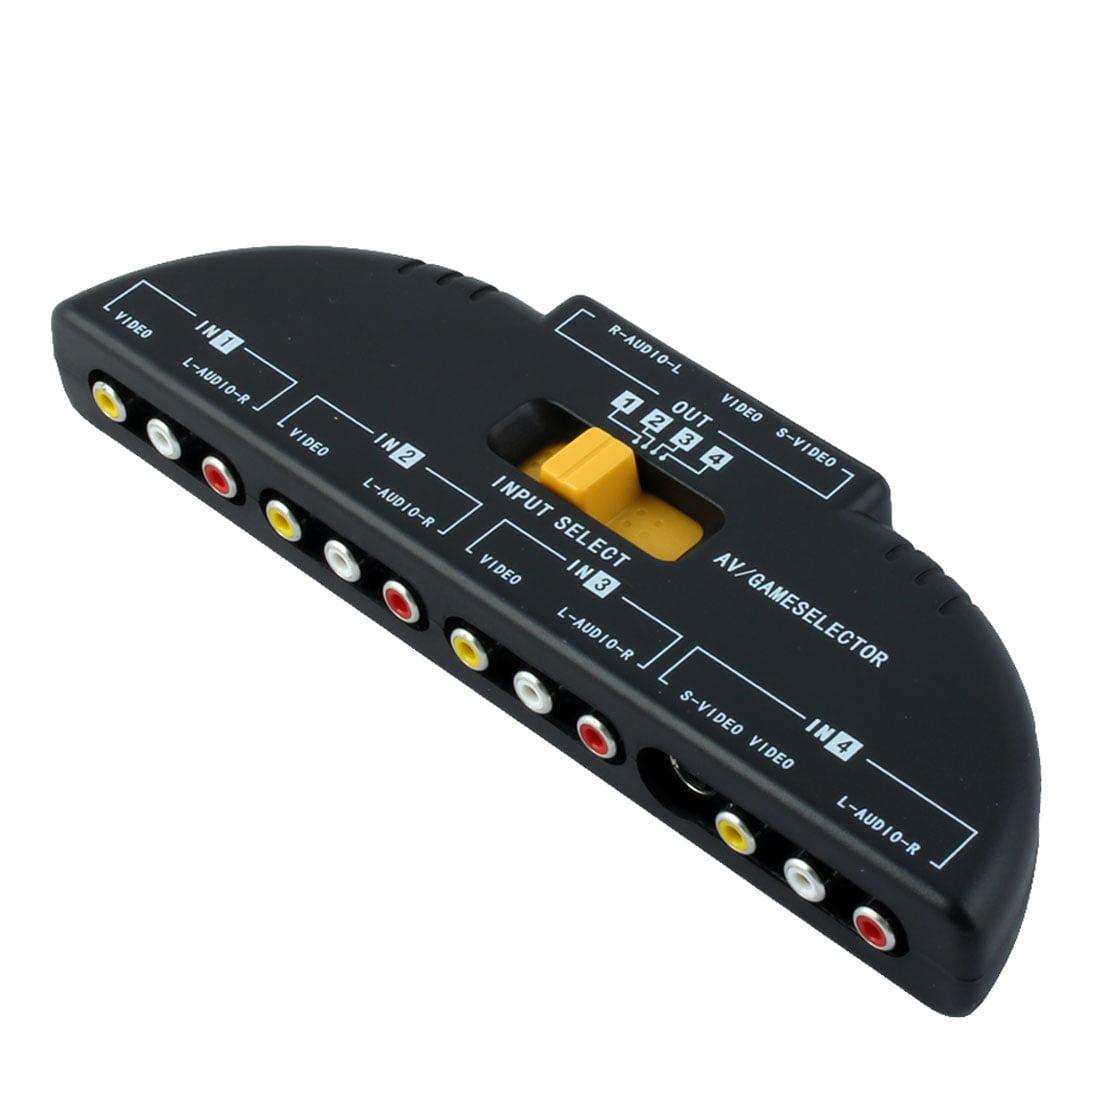 Unique Bargains 4-Way Port Audio Video AV RCA Game Selector Switcher Switch Box Splitter Black